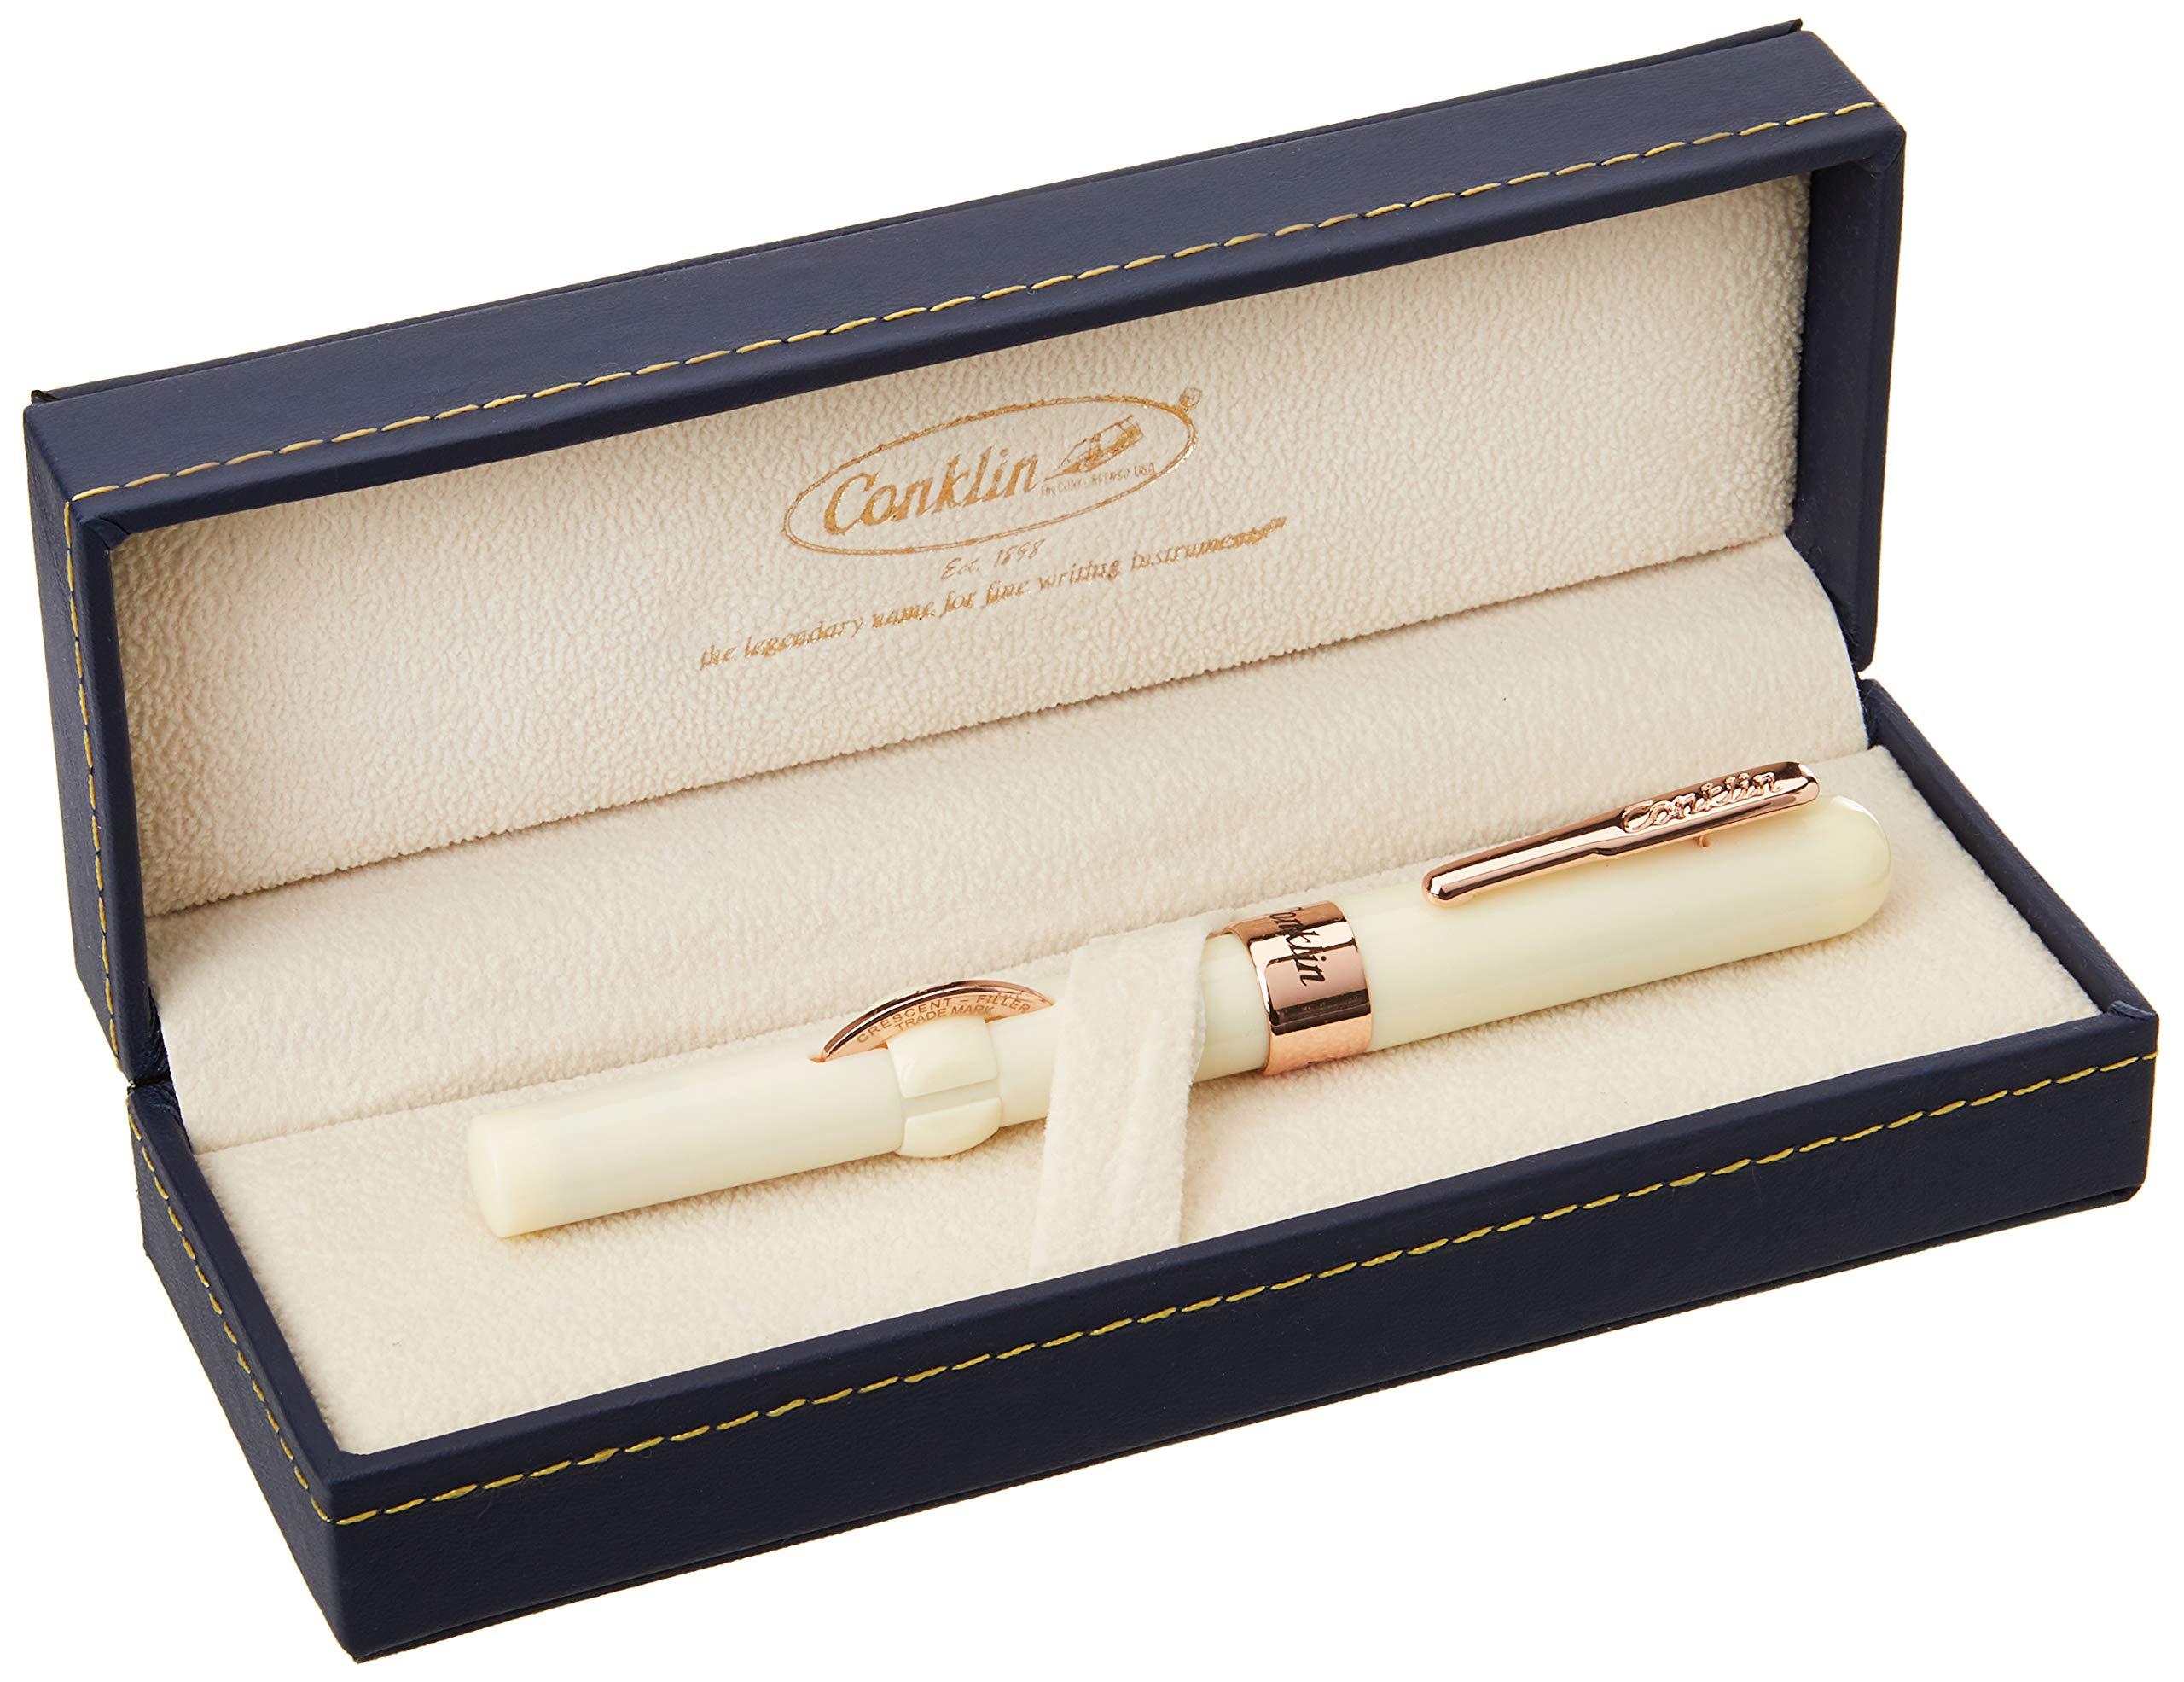 Conklin Mark Twain Crescent Filler Fountain Pen (Ivory) - Fine Nib Fountain Pen, Ivory (CK71780:CK7181) by Conklin (Image #2)